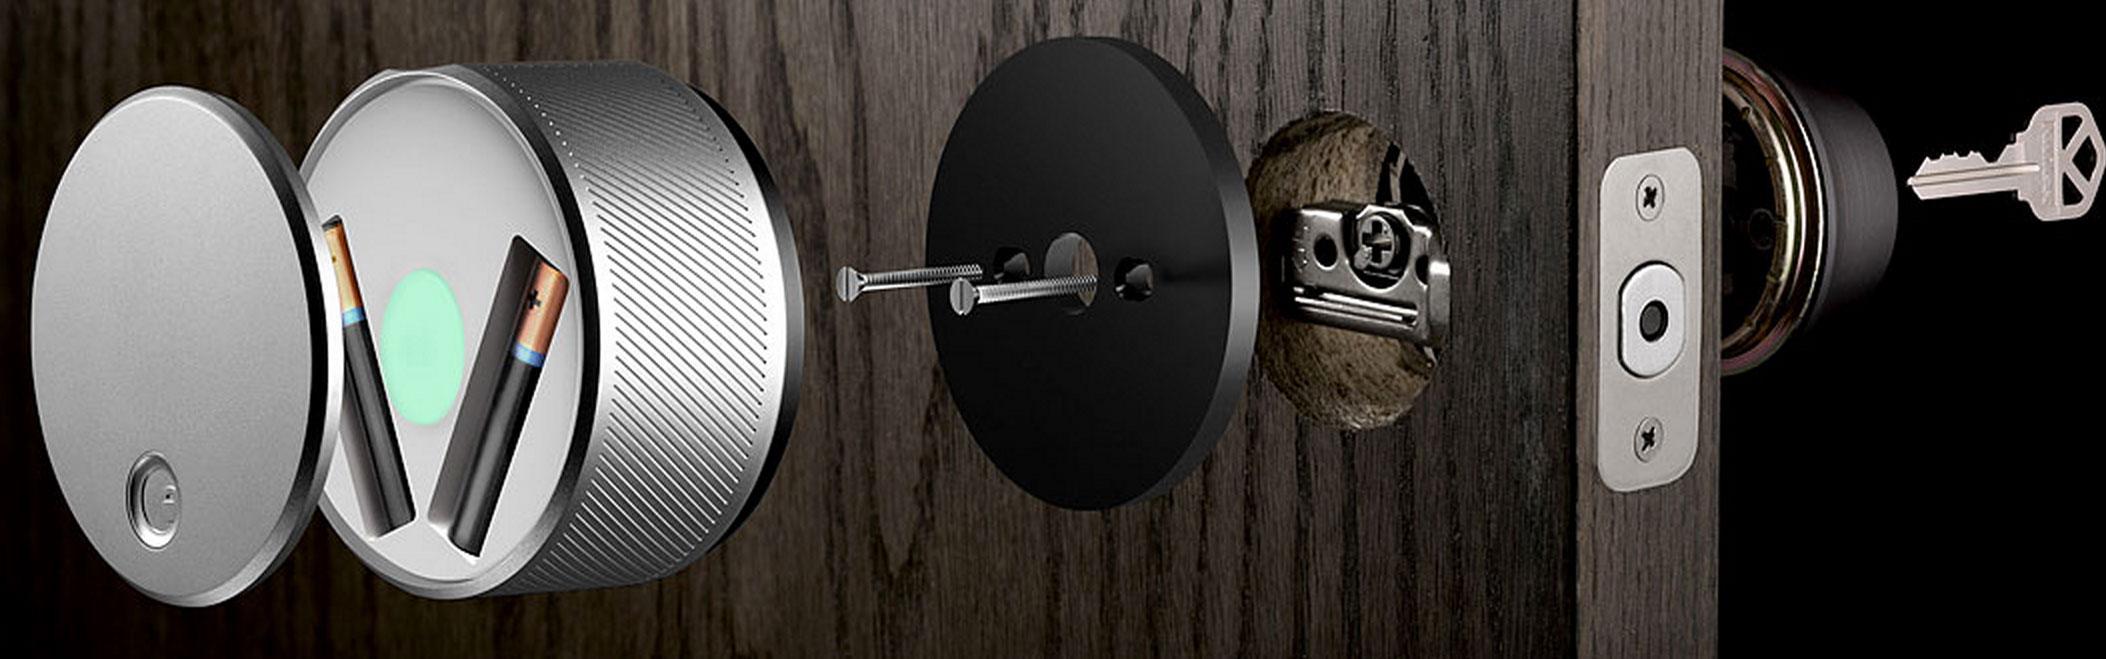 August Smart Lock installati